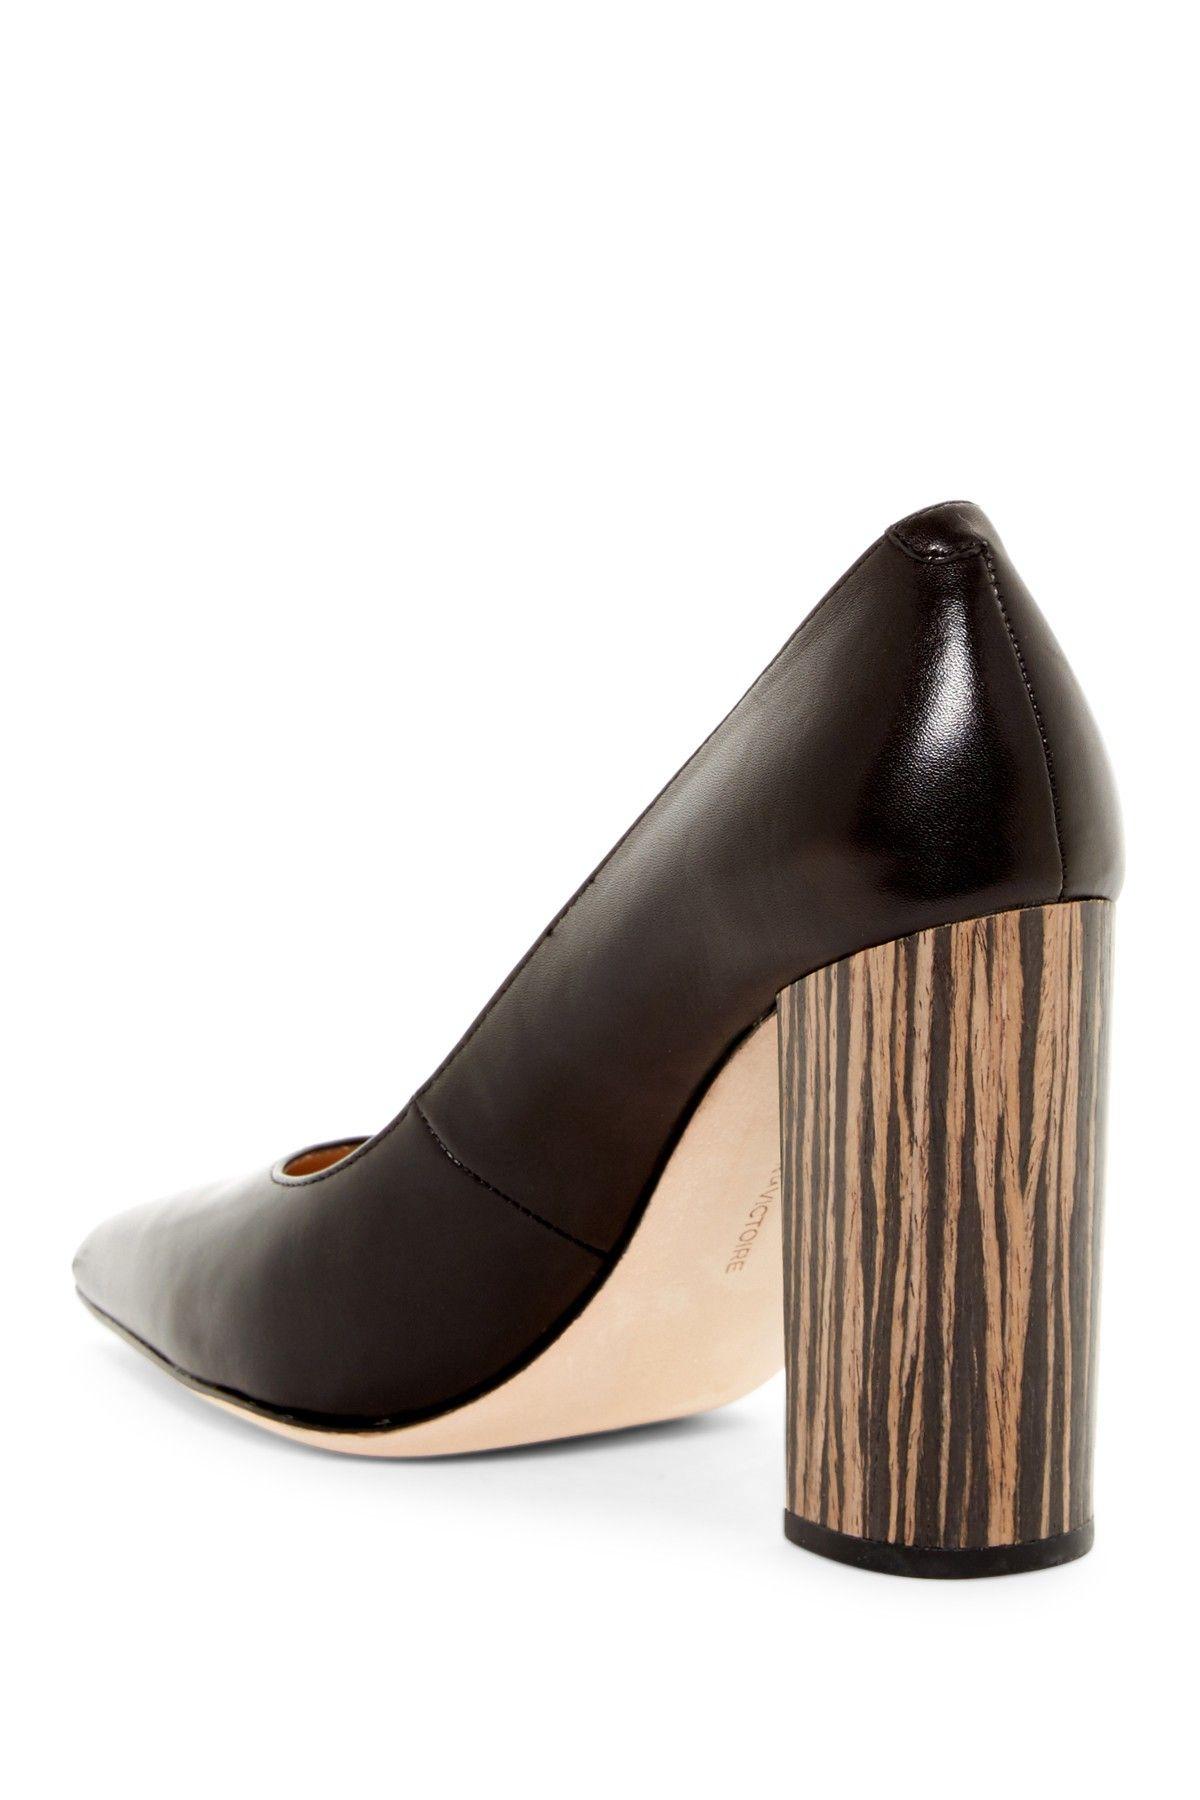 Celina Block Heel Pump by Pour La Victoire on @nordstrom_rack